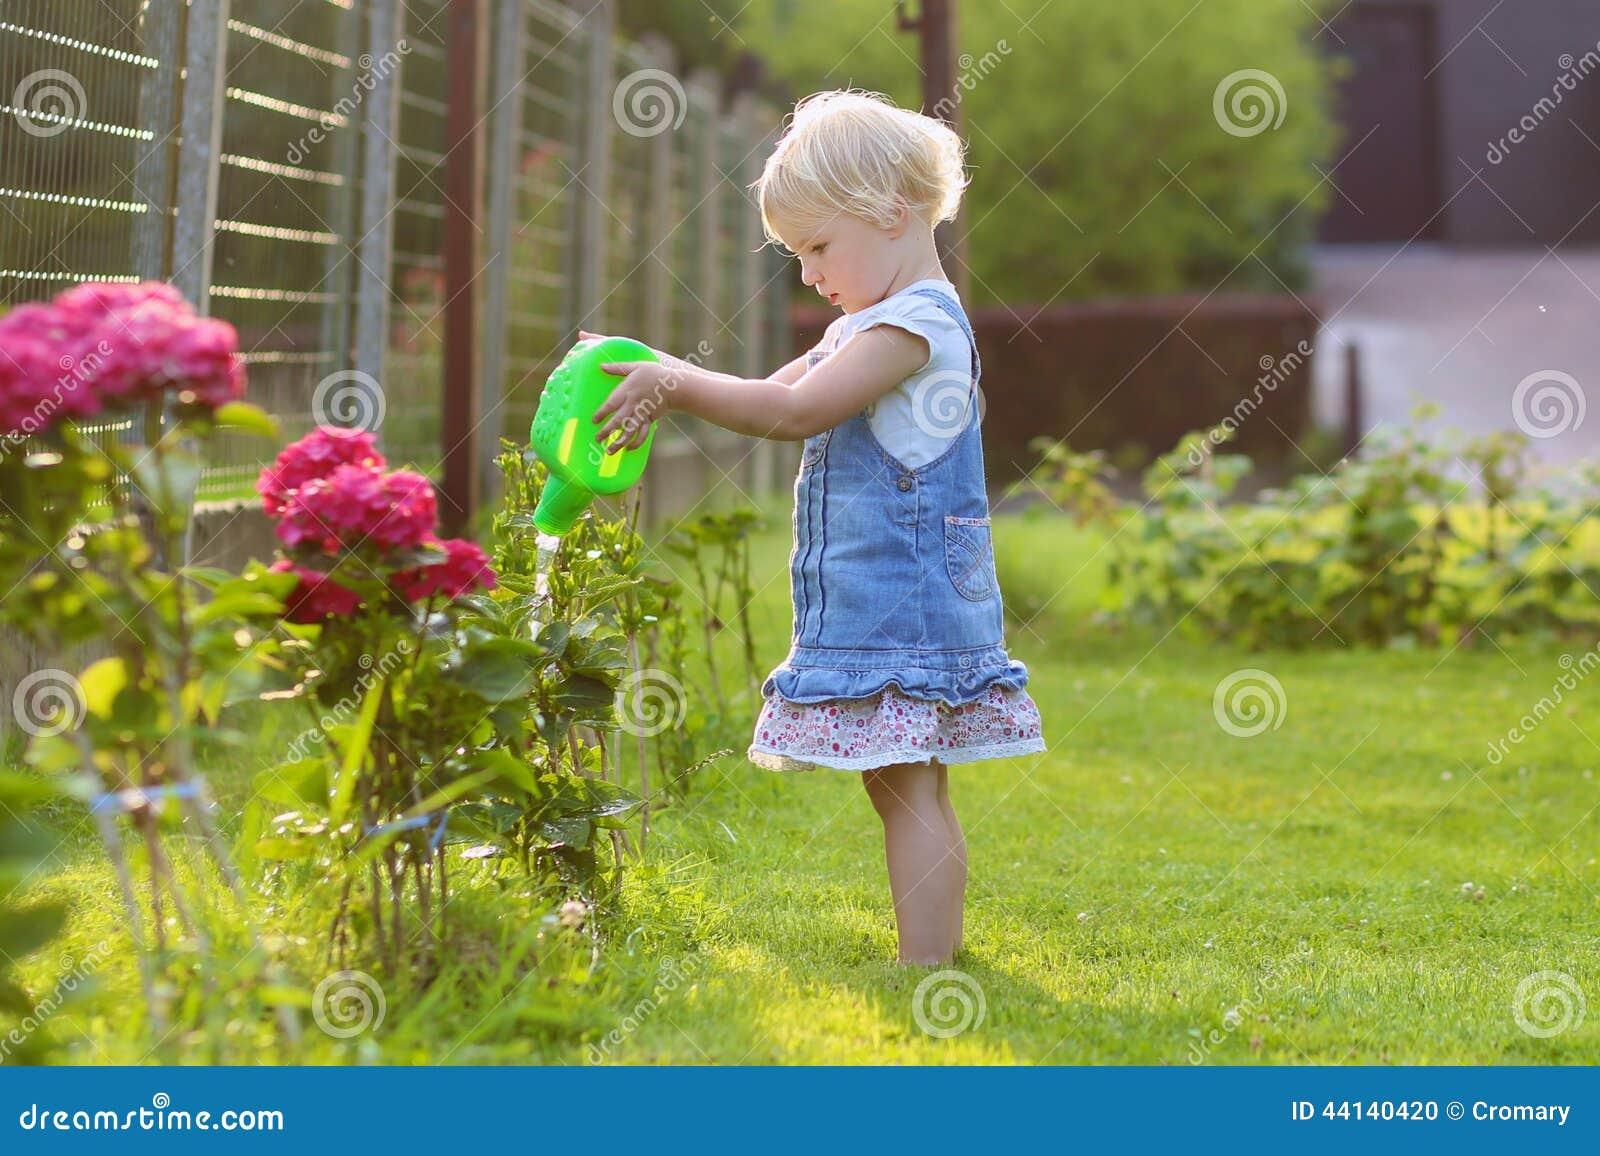 Cute little girl giving water garden flowers